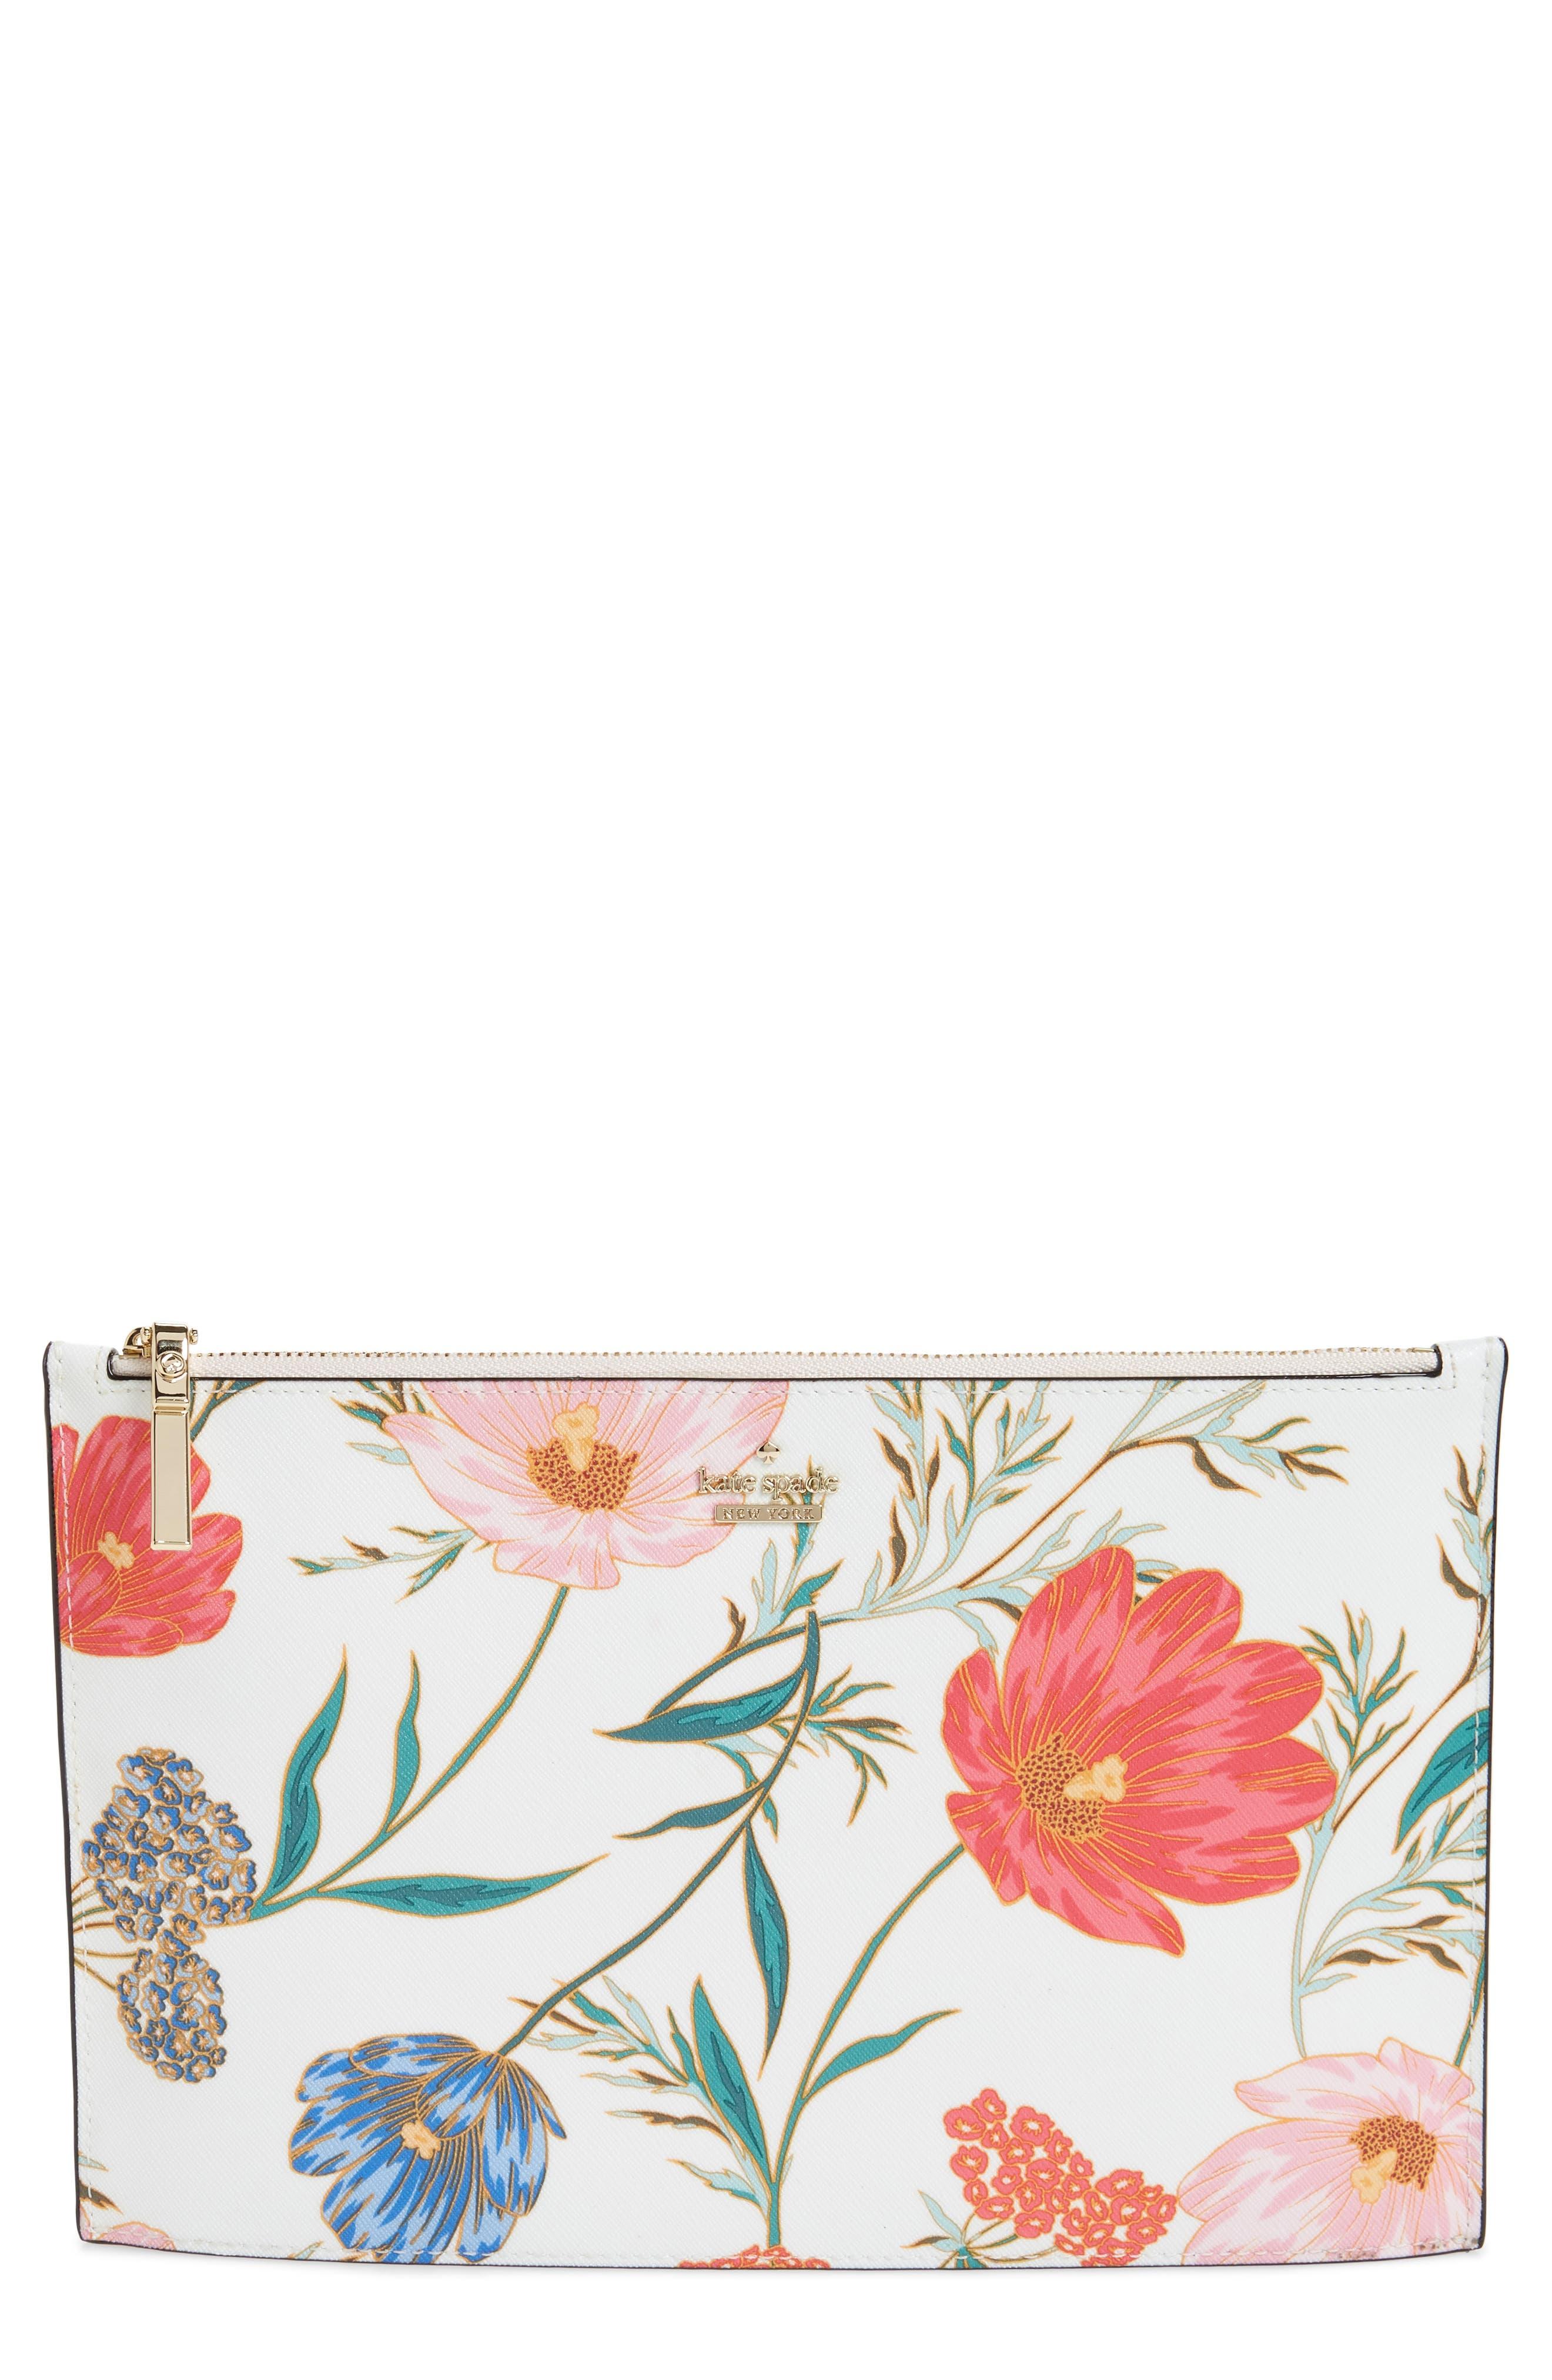 cameron street – blossom lilia leather clutch,                         Main,                         color,